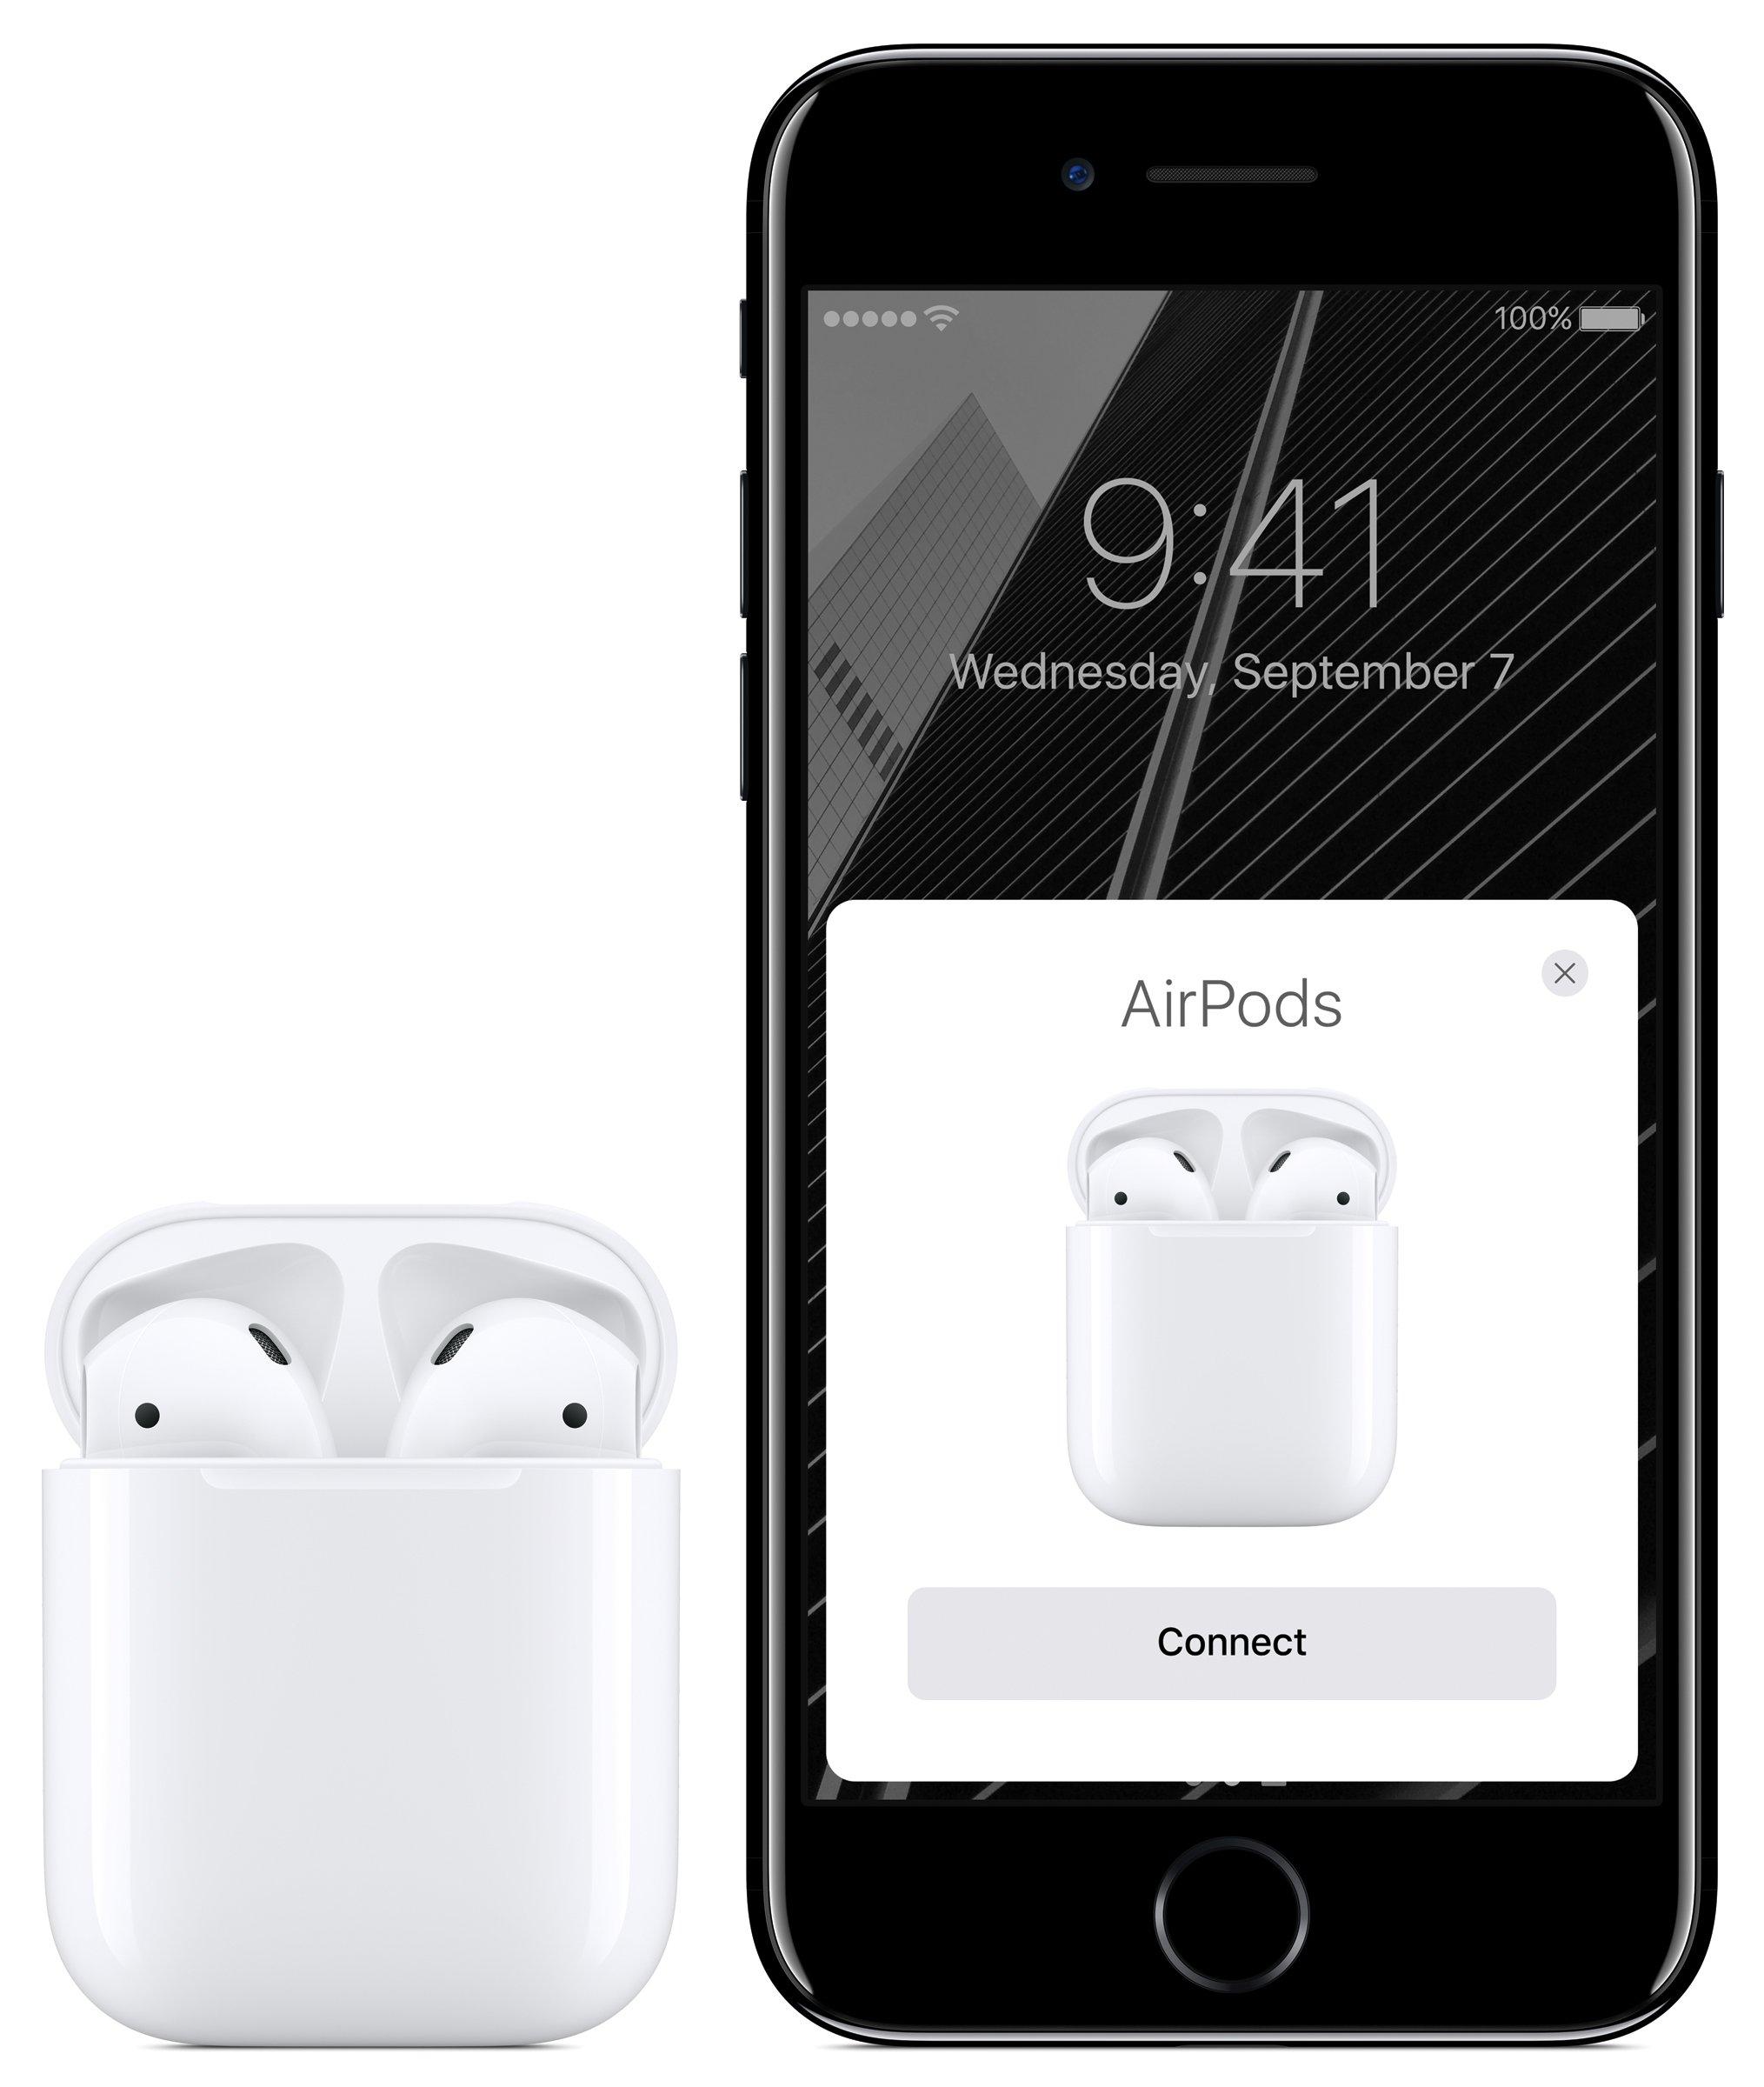 airpodscase-pf-open_airpods-pf_iphone7-jetblk-pf_pr-print